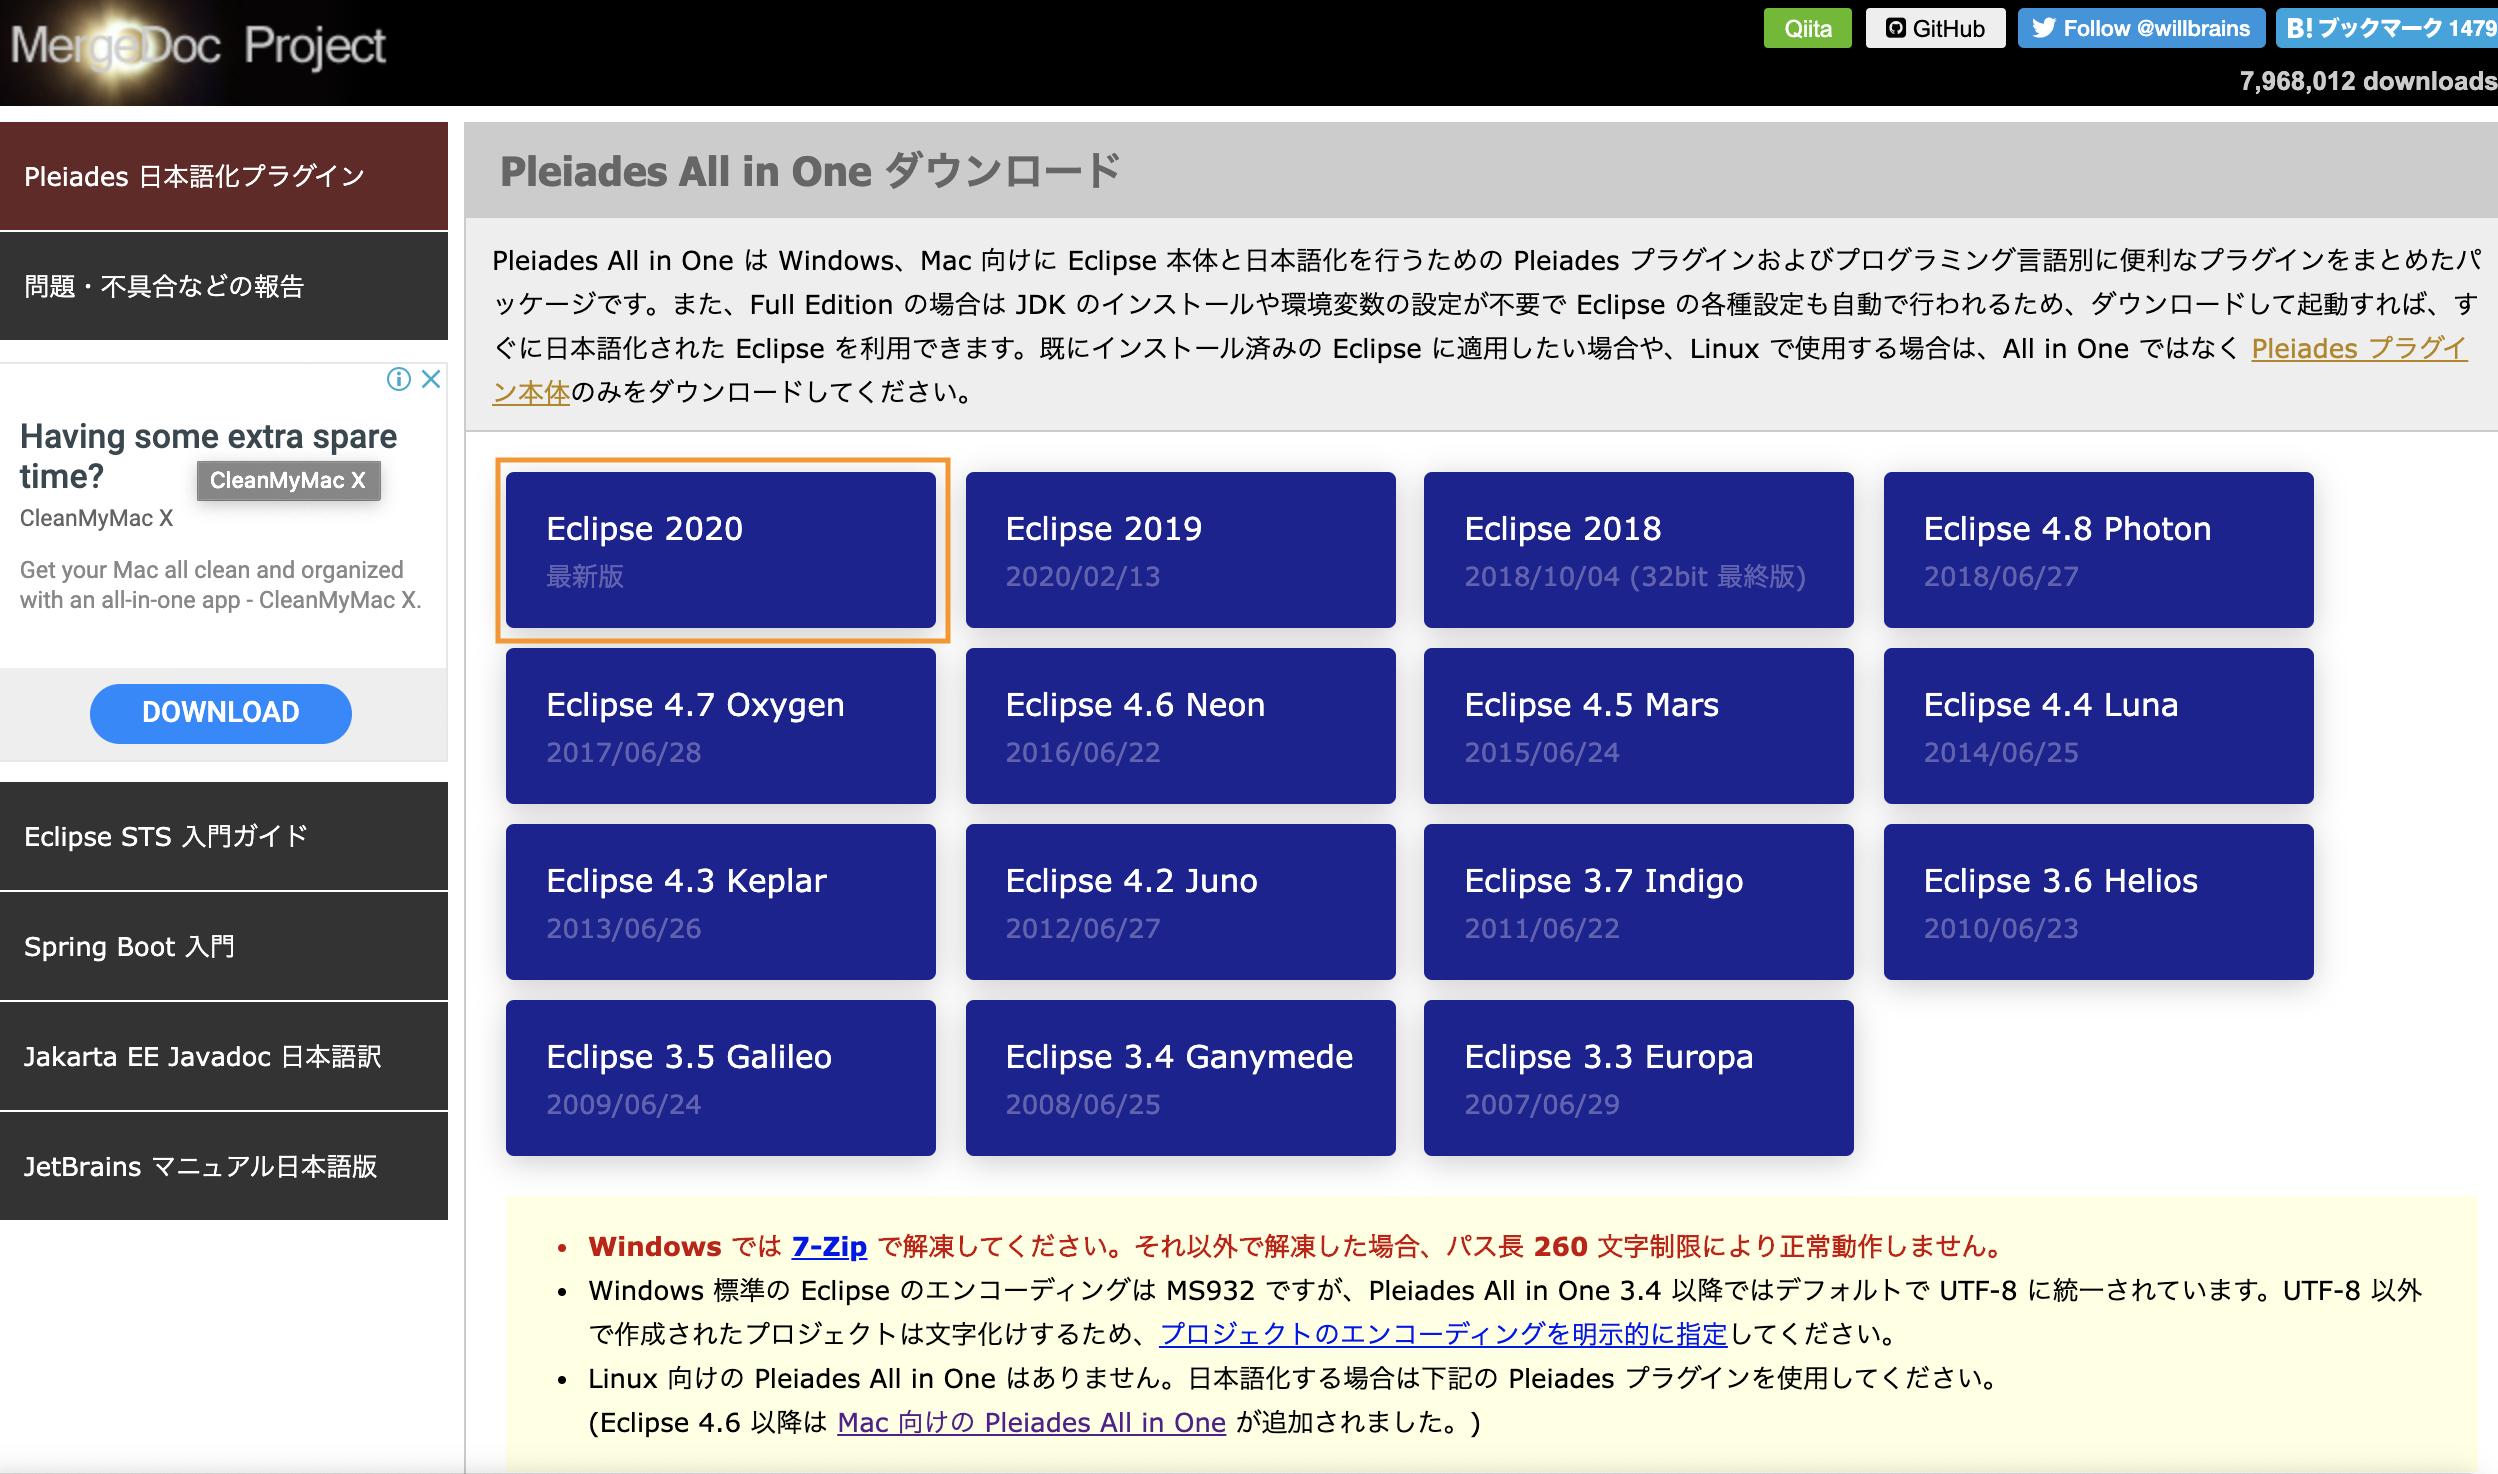 Screenshot 2020-06-07 22.22.50.png